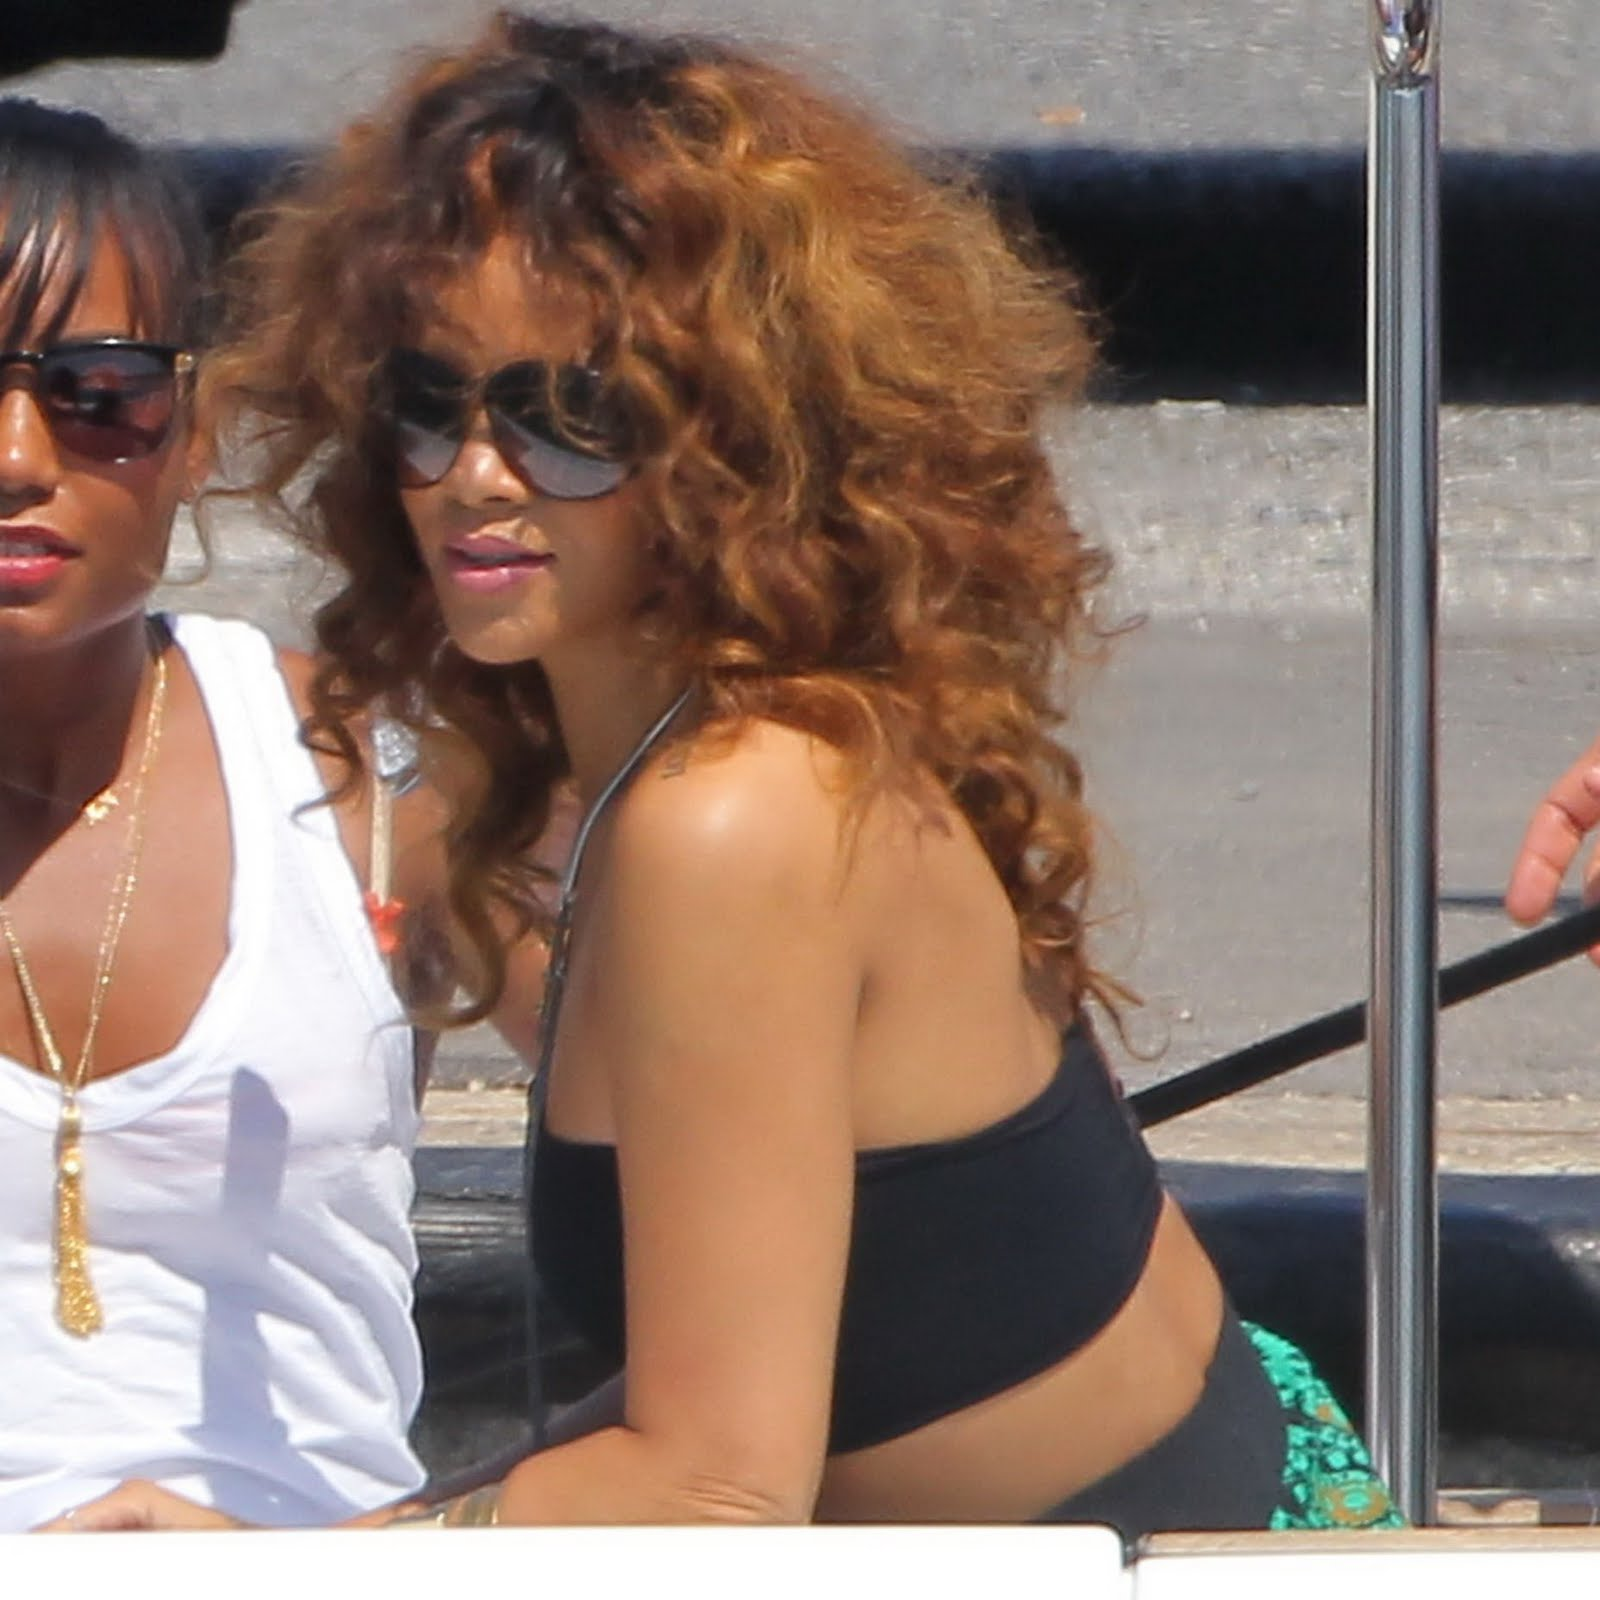 http://3.bp.blogspot.com/-UBIpIcF-fUM/TlOkCNtzi4I/AAAAAAAAB7M/DCUqGoJQ8PM/s1600/RihannaBigBoobsInSexyTop2.jpg